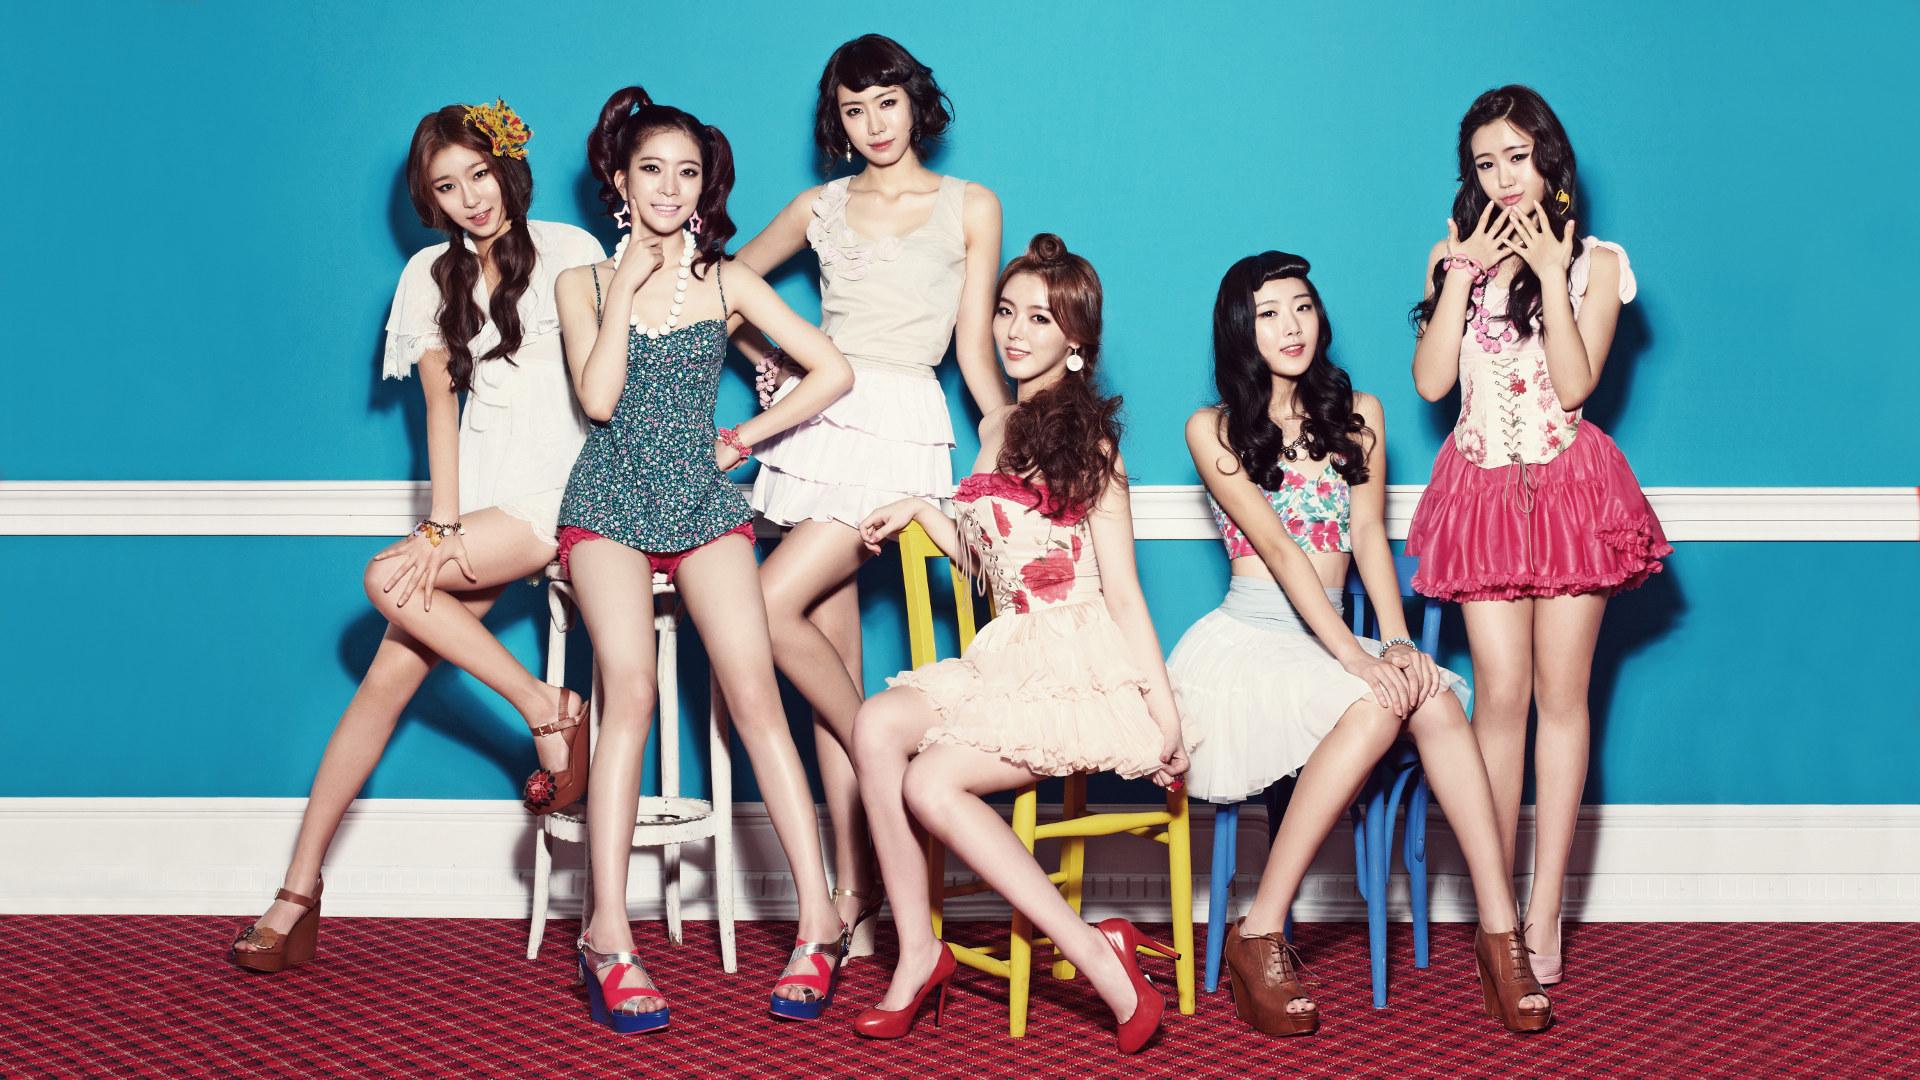 Dal Shabet Desktop Kpop Girl Band Korea wallpaper by hoantube2014 1920x1080